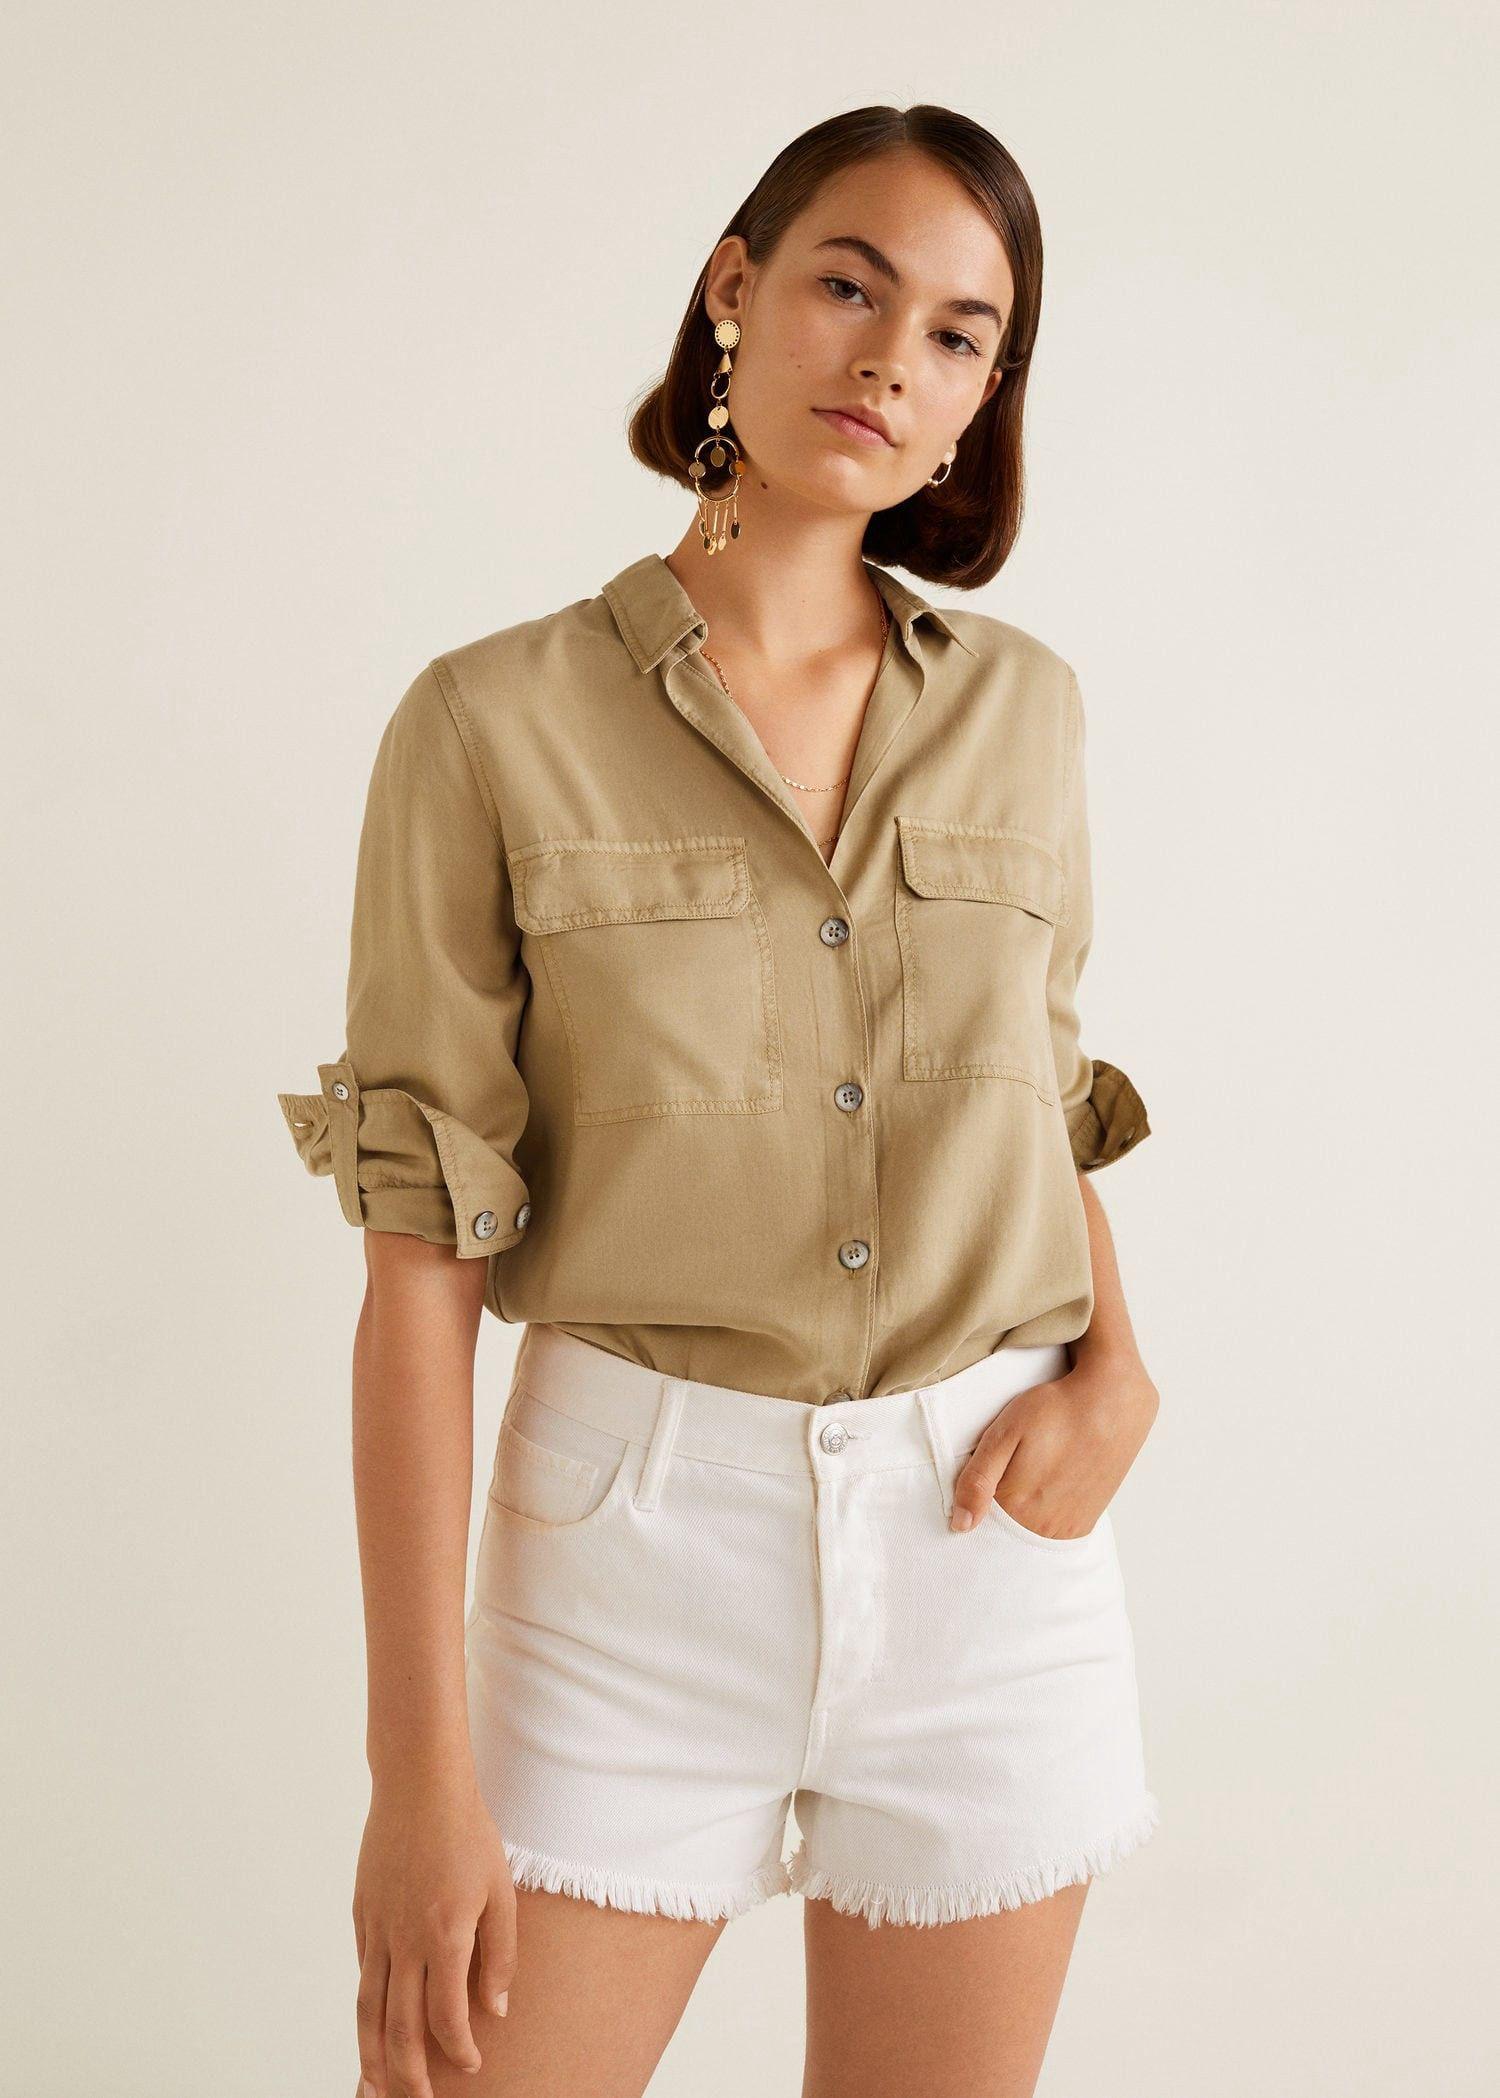 2659a44f4f7214 Mango Chest-Pocket Soft Shirt - 4